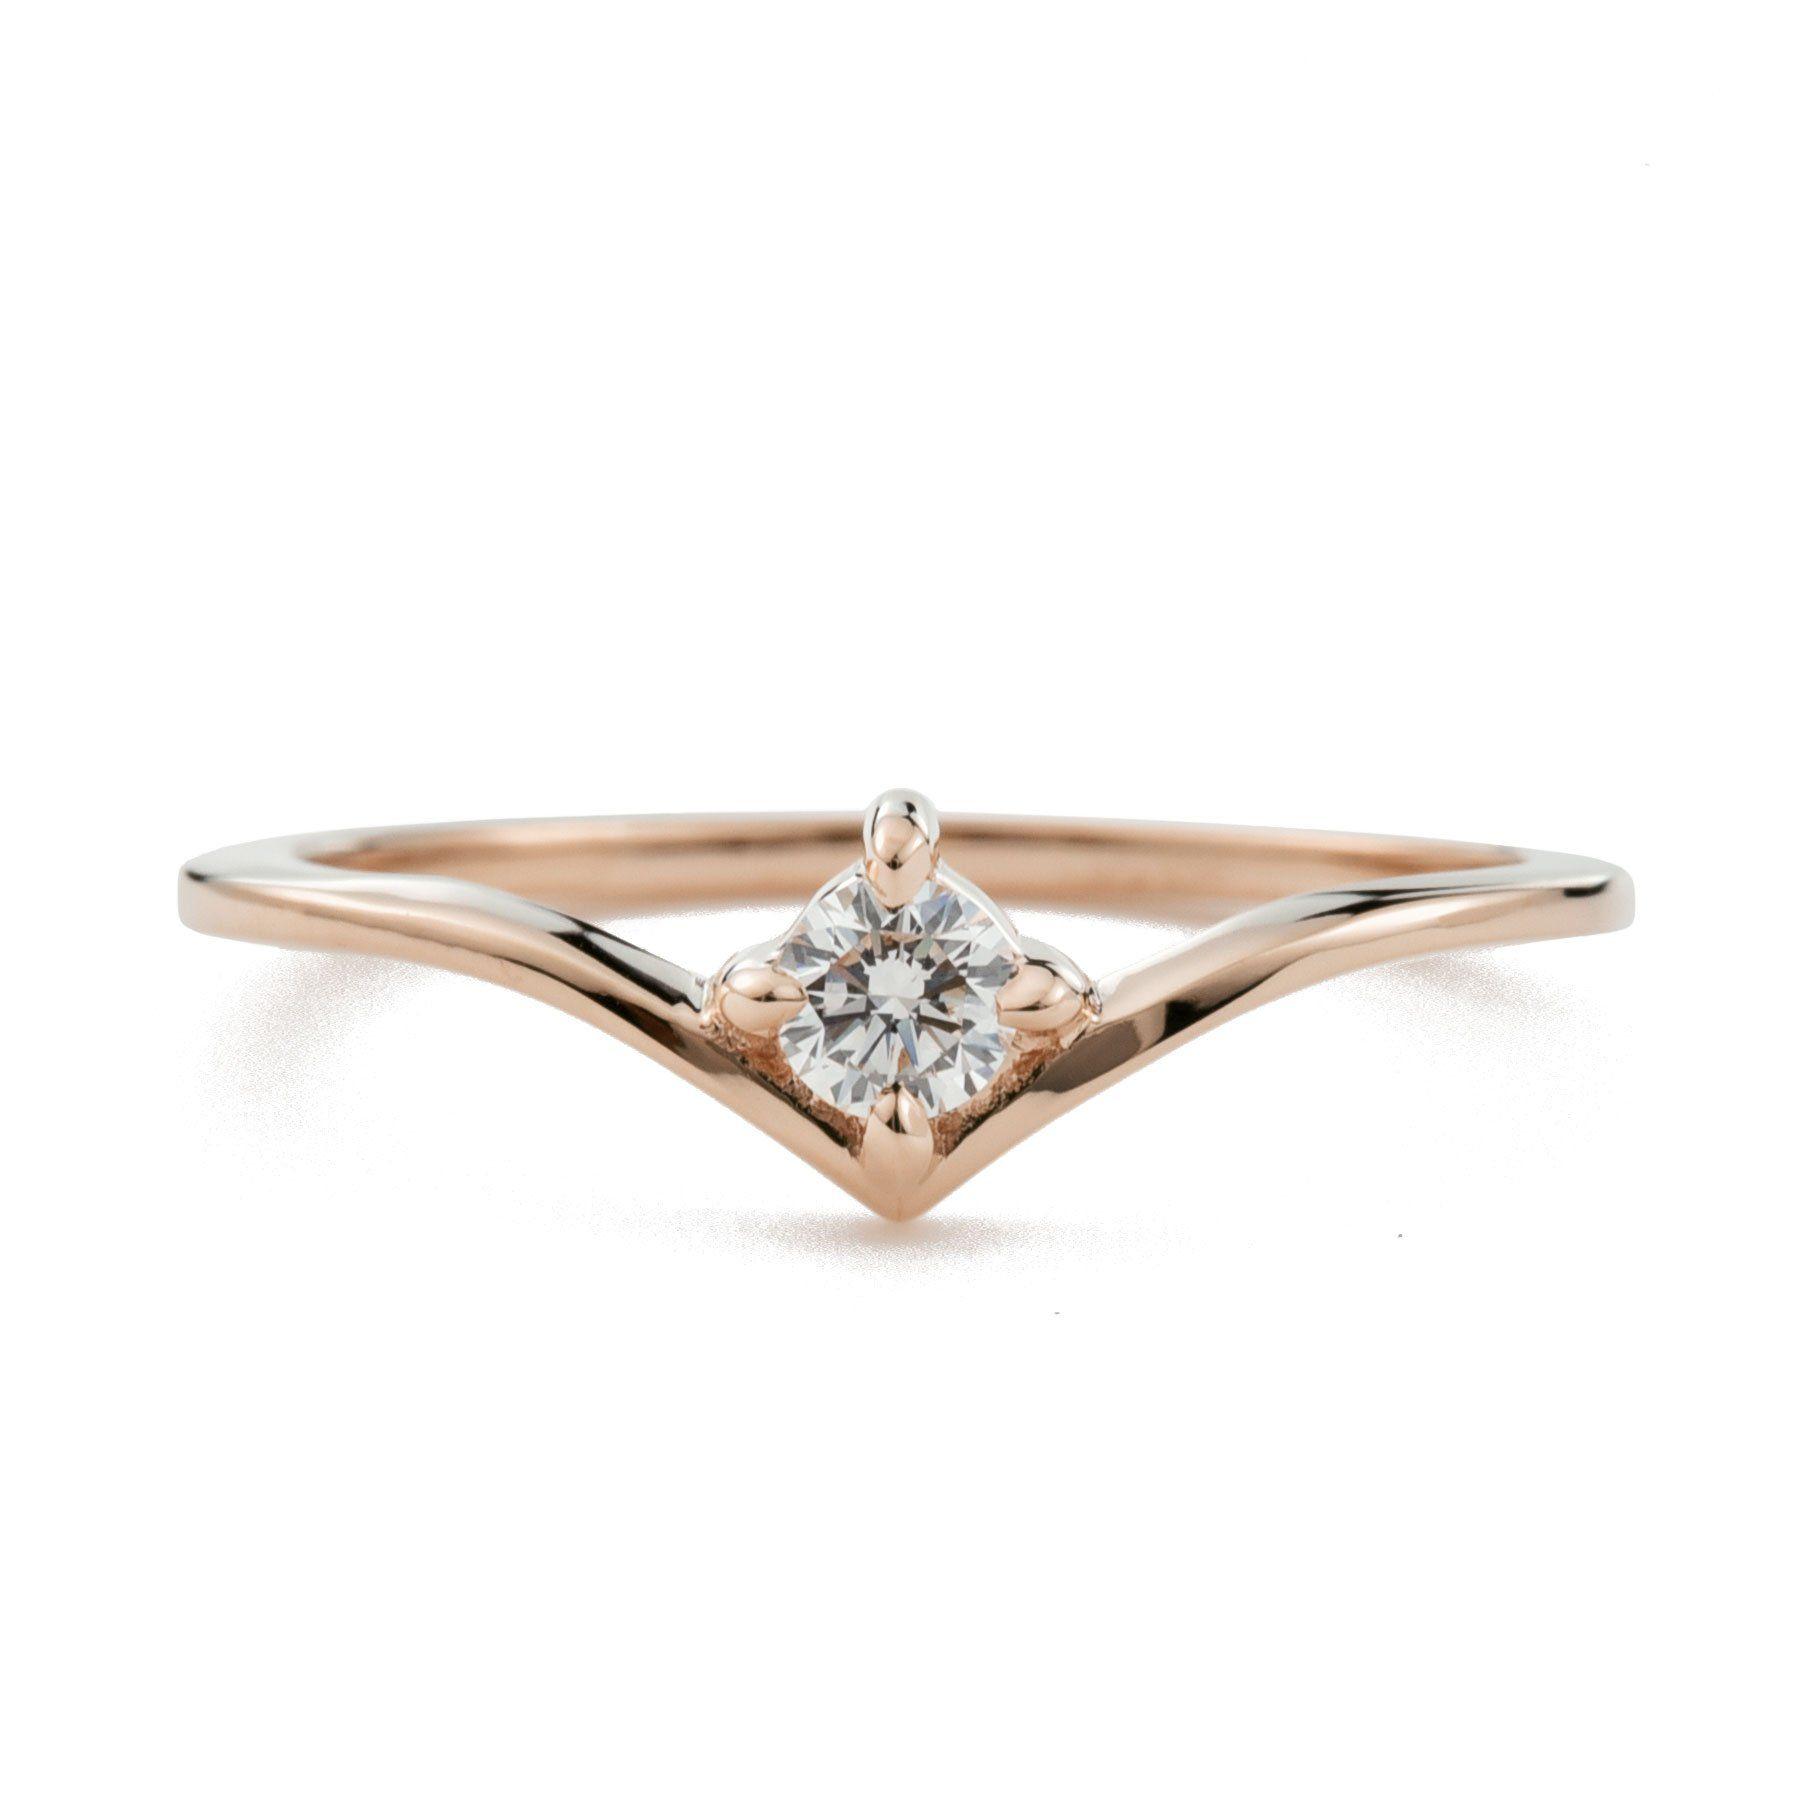 Valerie Madison Supernova Diamond Ring